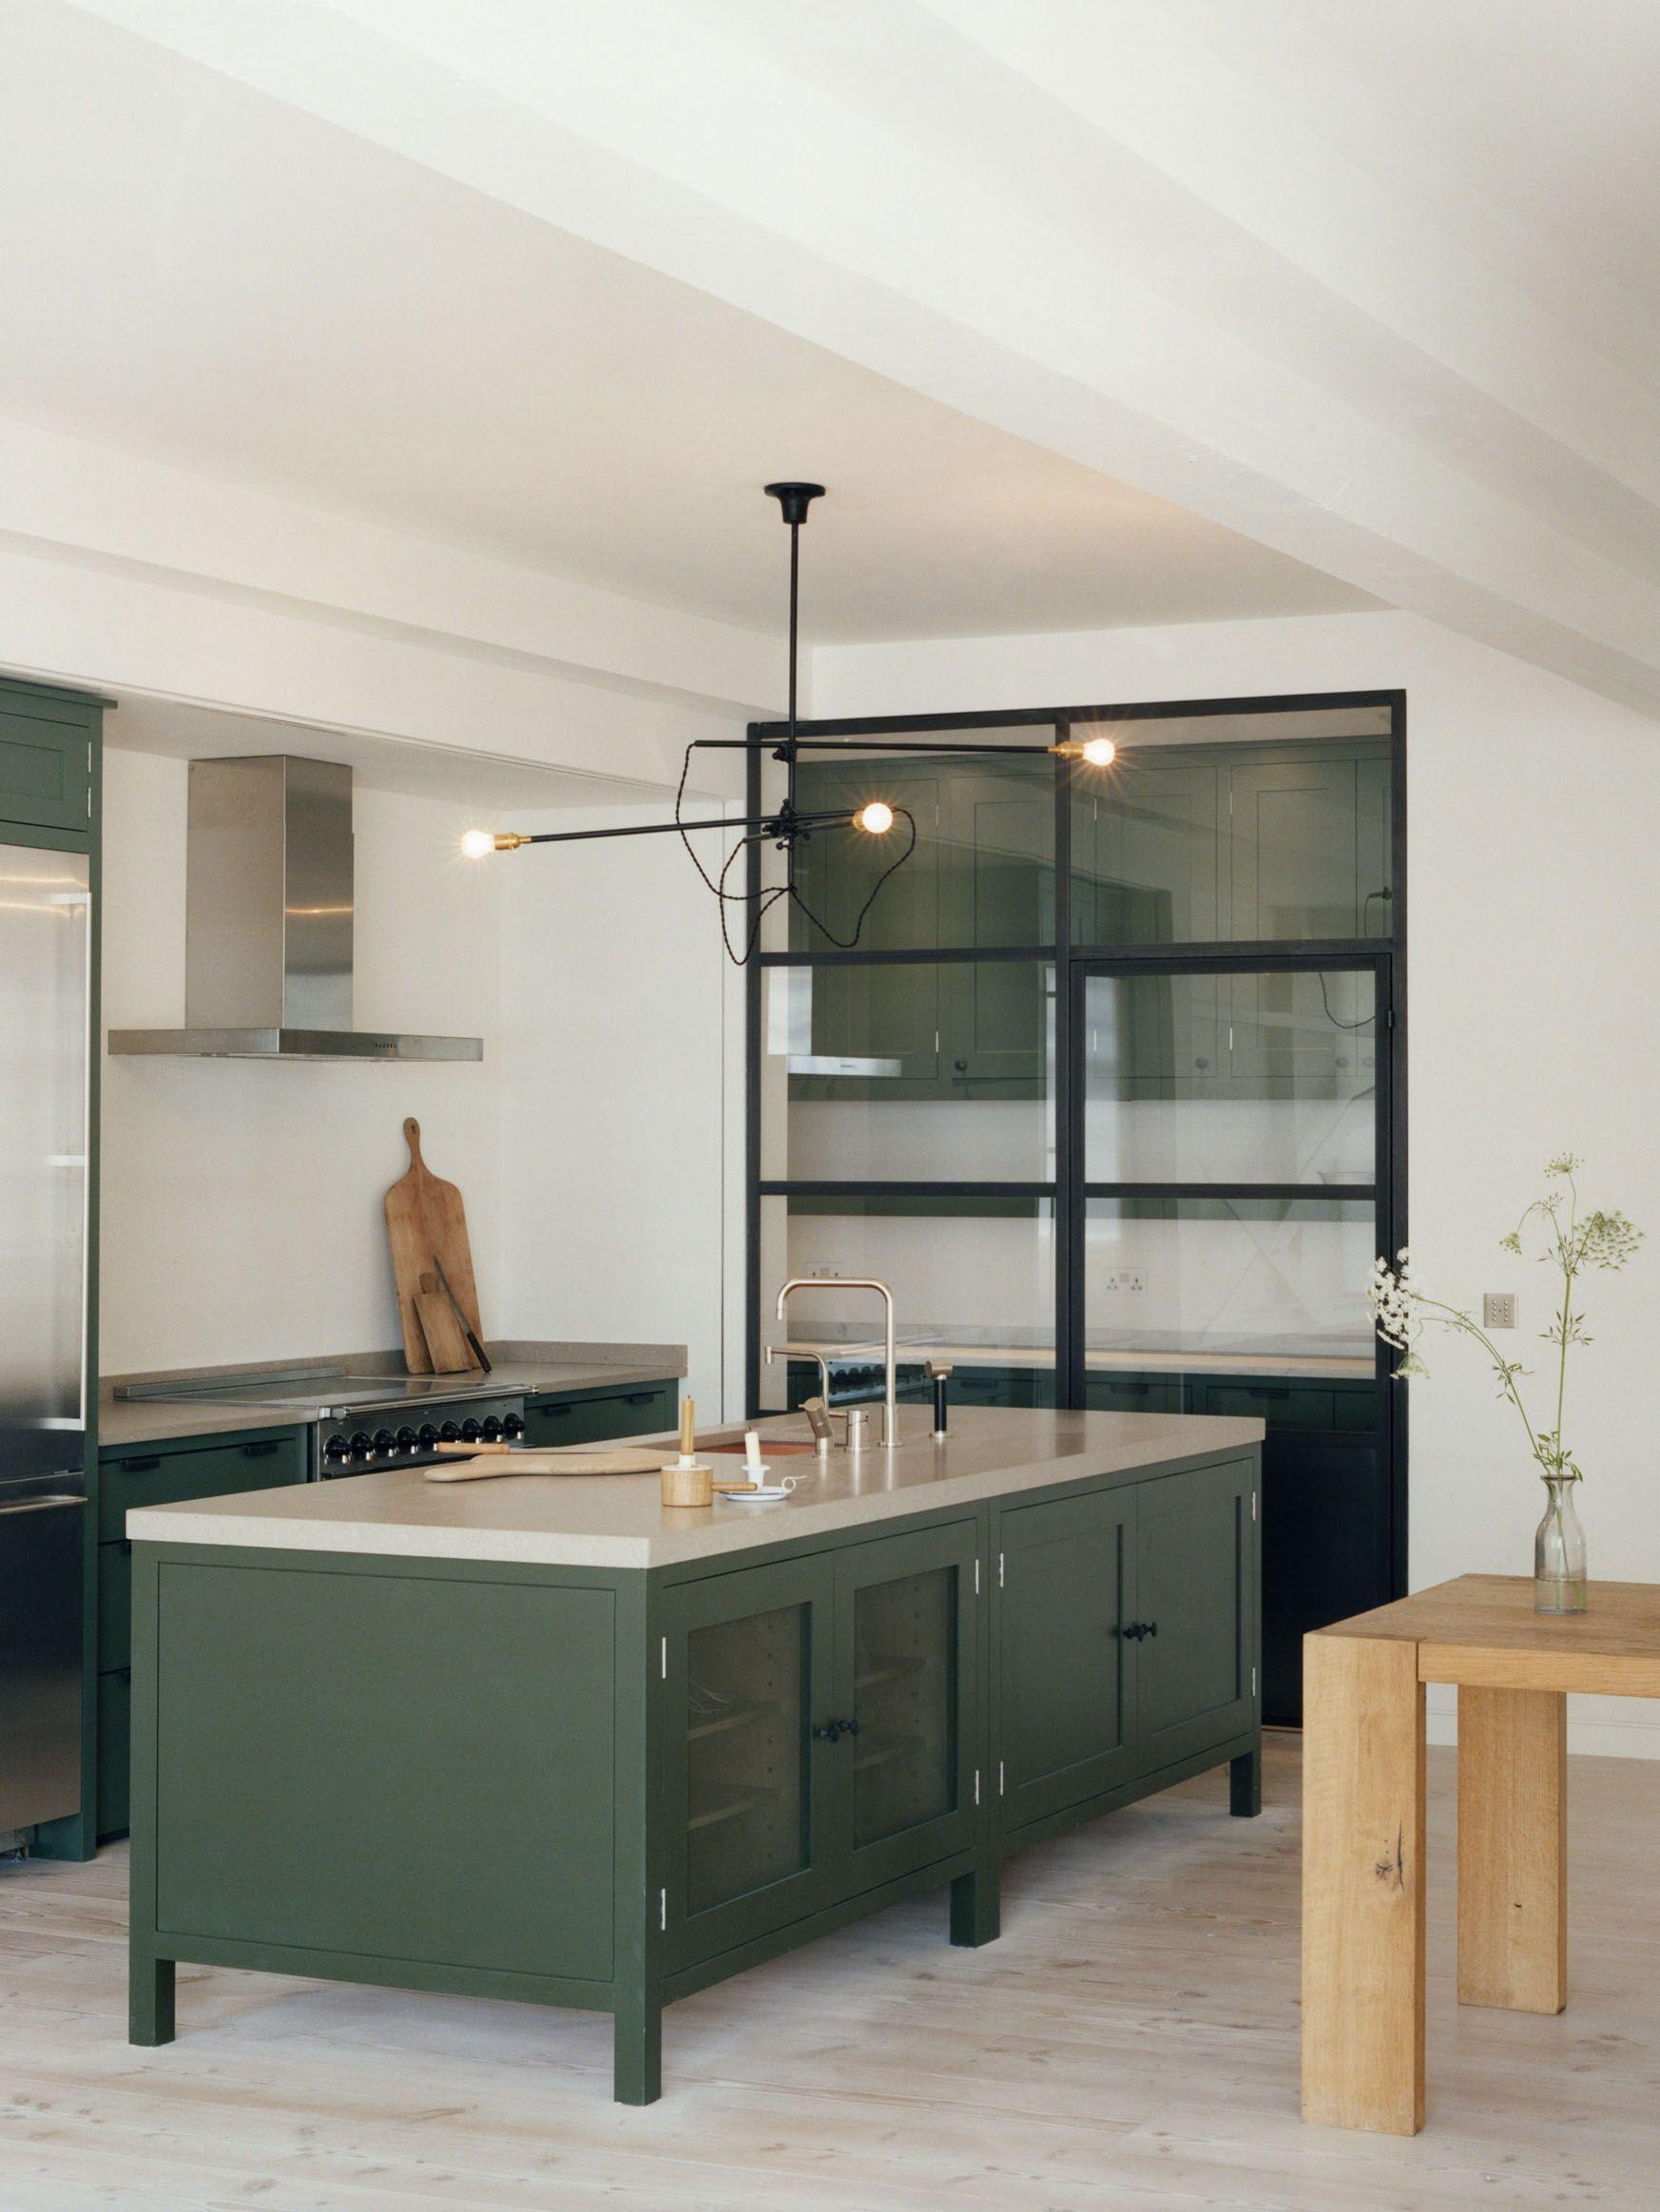 Green Cabinet Kitchens  Lexi Westergard Design Blog  In